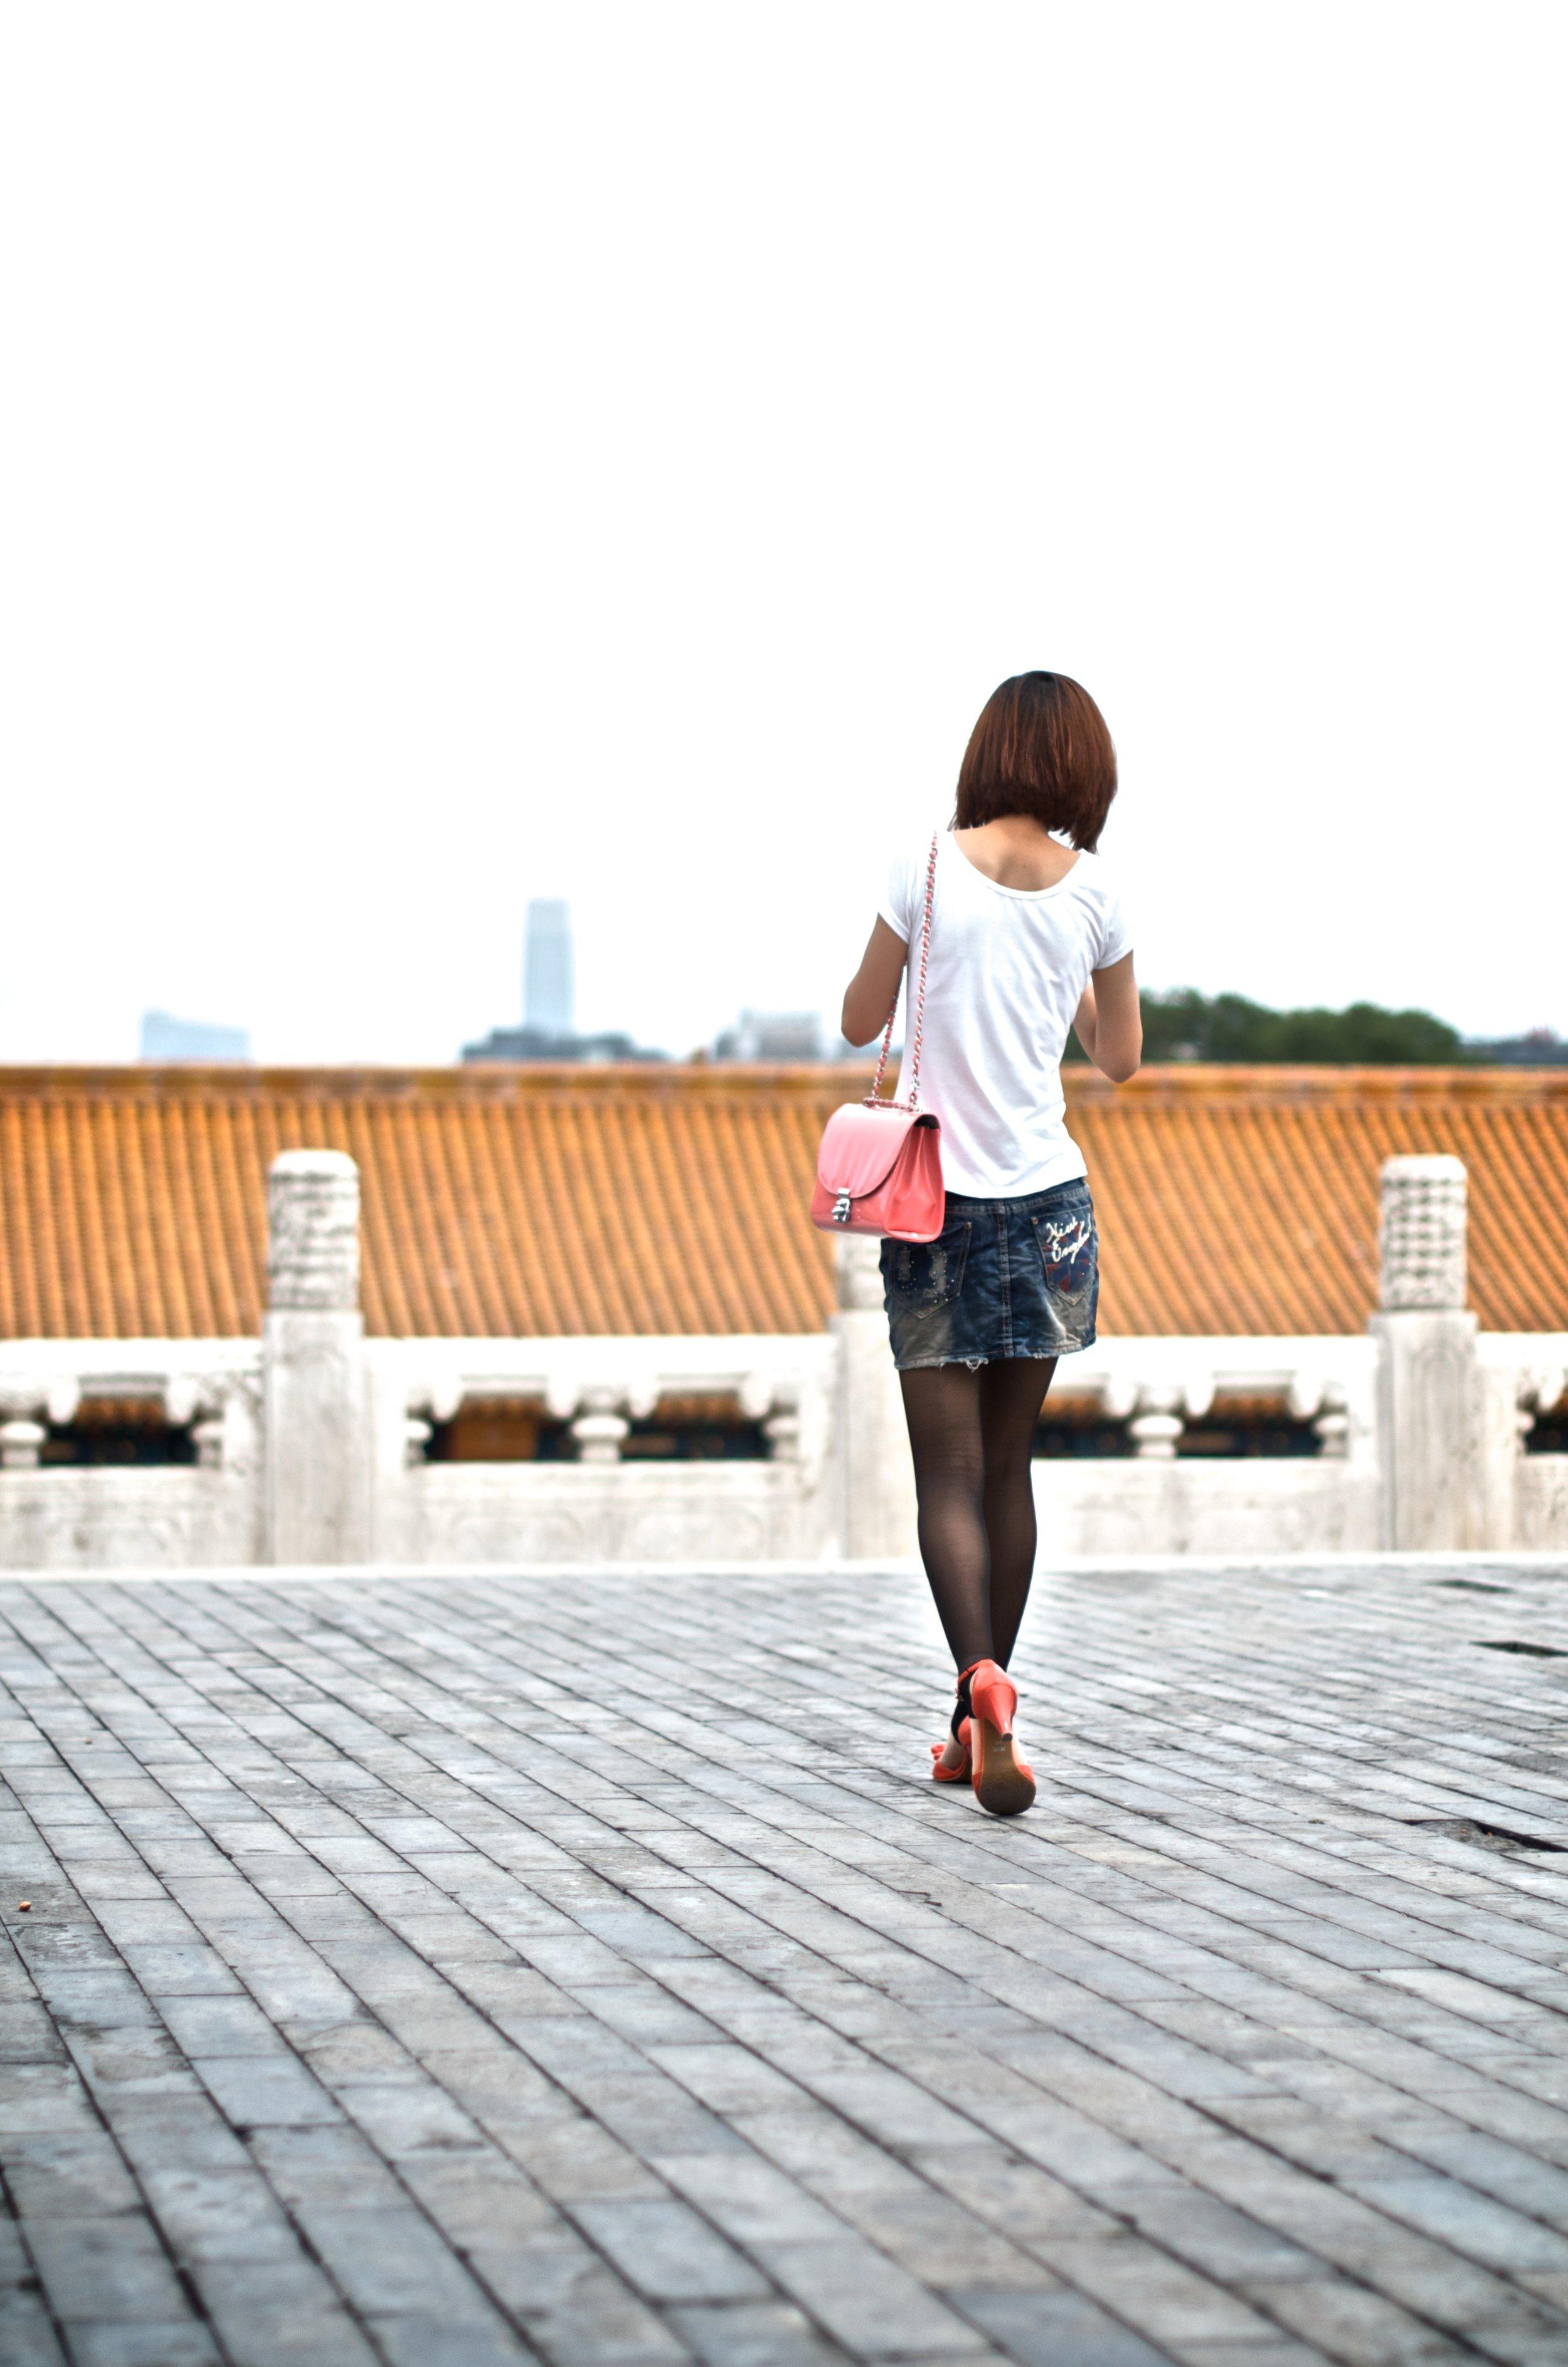 stock-photo-forbidden-catwalk-2202520.jpg